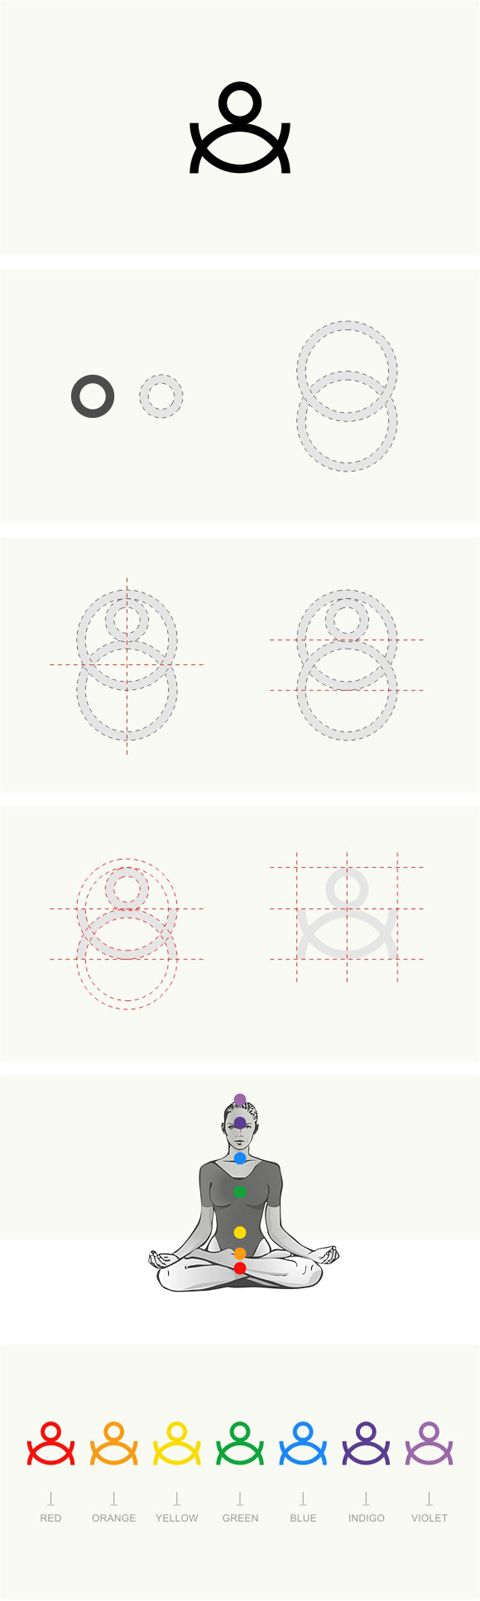 """O"" Yoga & Pilates medicine school - Brand Identity, design by Vasilis Magoulas / #yoga #identity"